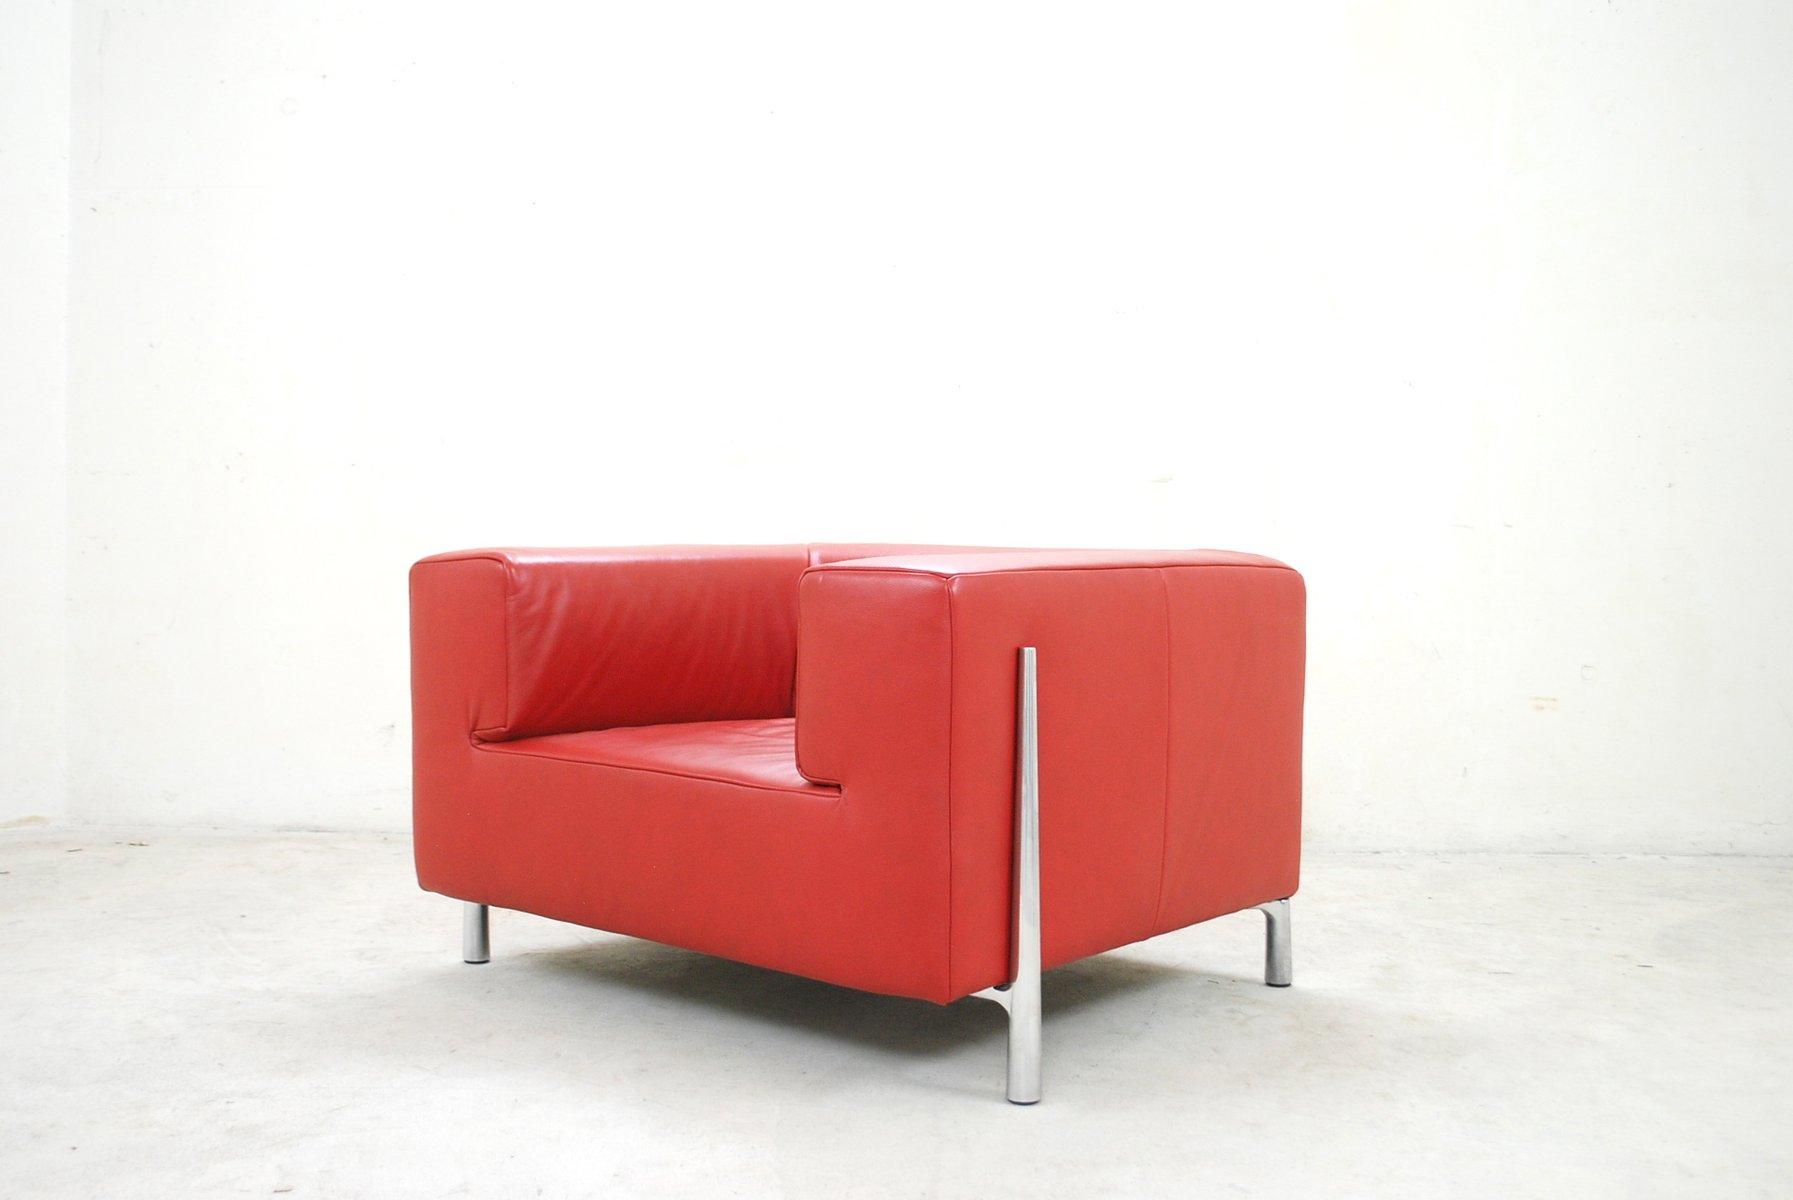 Wunderbar Koinor Lederfarben Foto Von Finest Red Leather Genesis Armchair By Cynthia